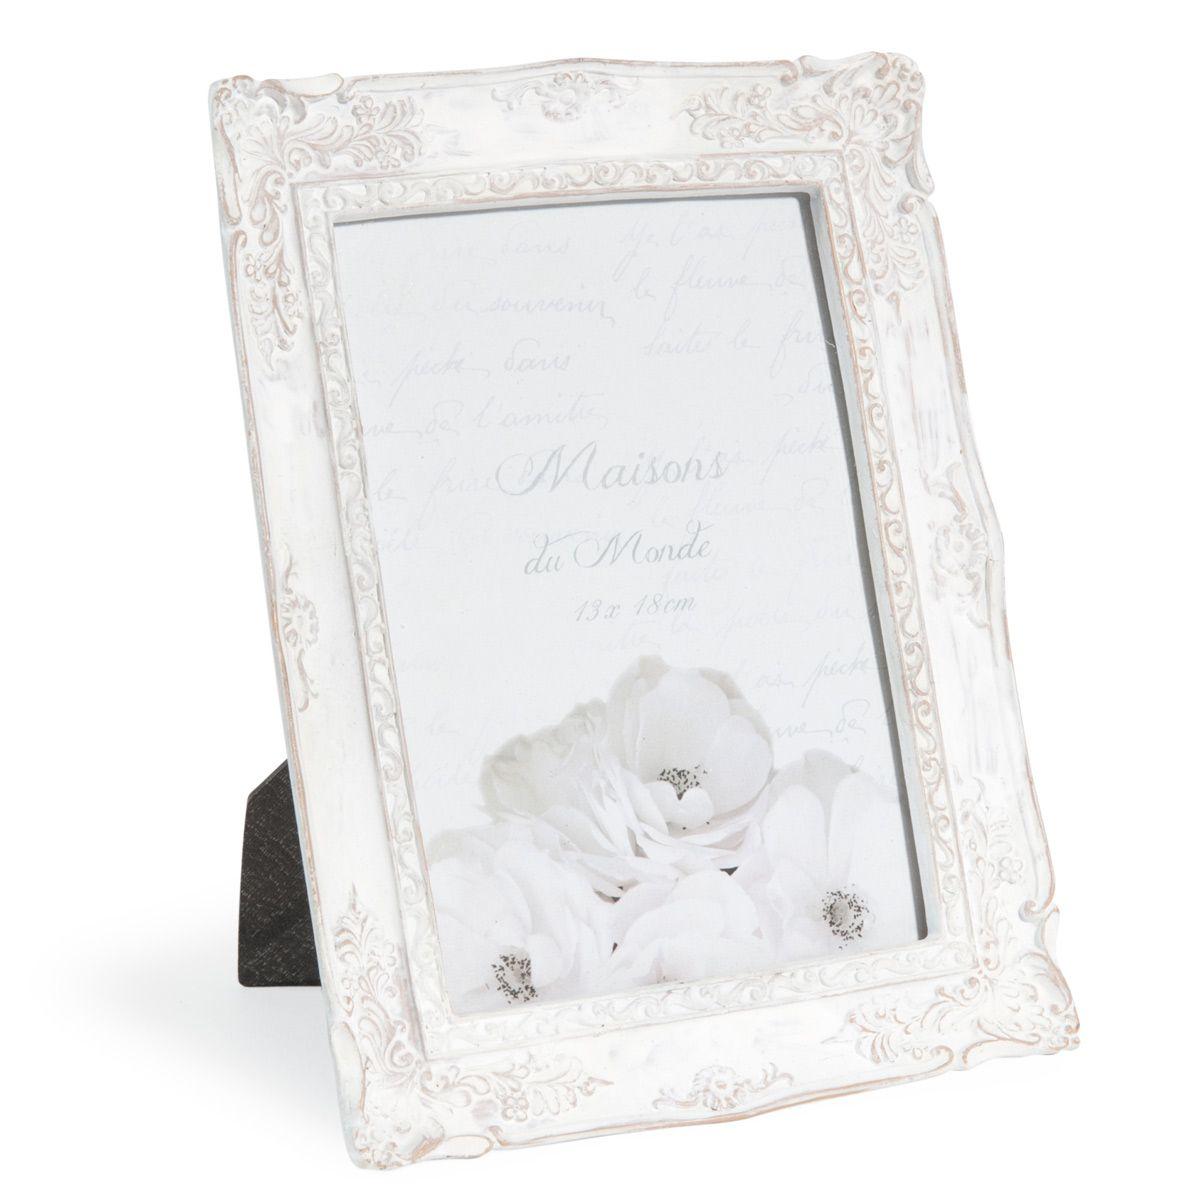 Richelieu Photo Frame Maisons Du Monde With Images Cadre Photo Frame Mirror Frames